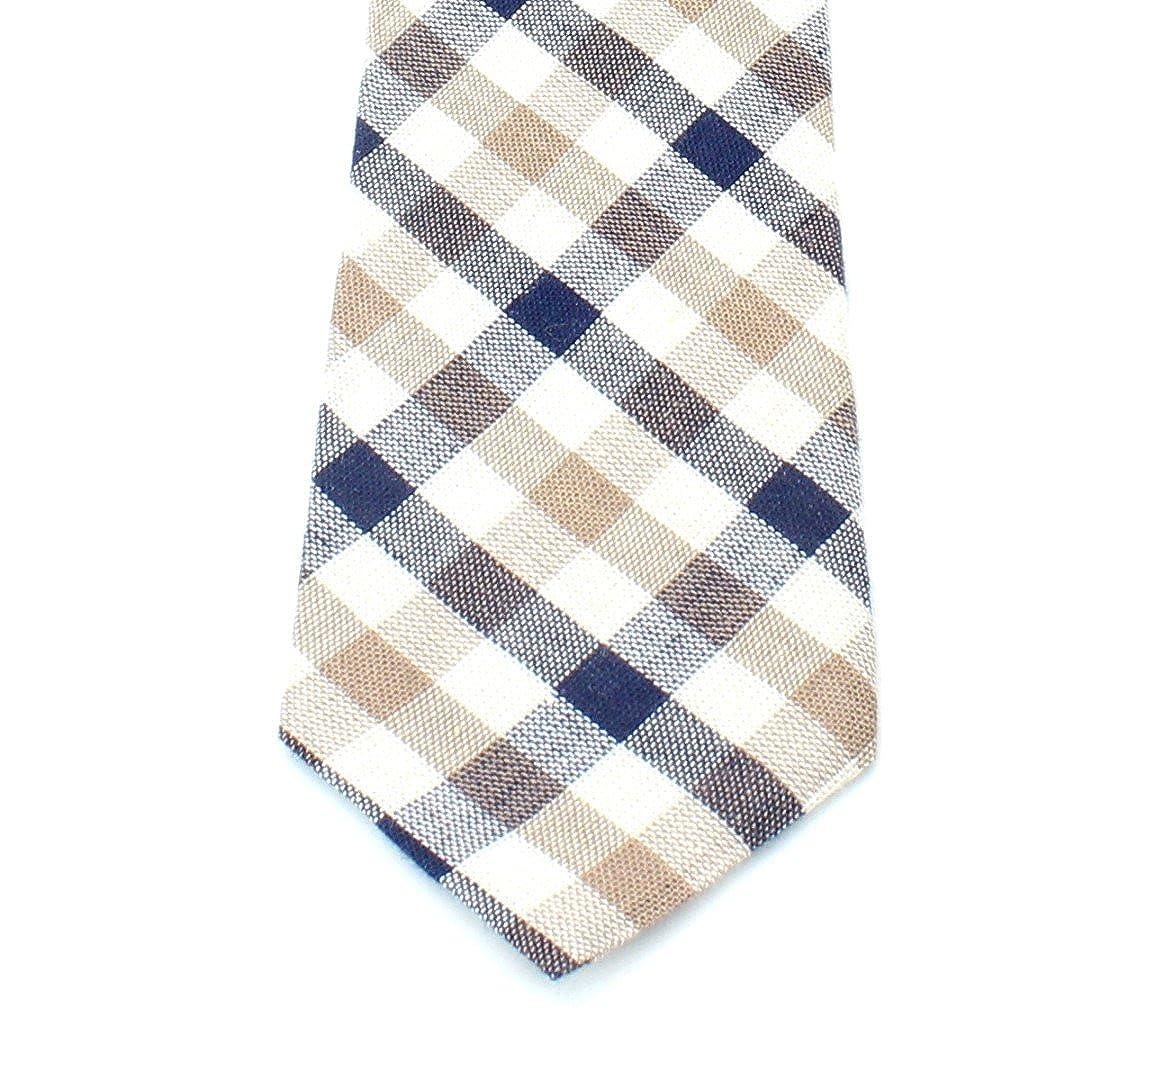 Kids Cotton Formal Necktie Tie Modern Checker Gingham Pattern Light Bright Colors 2 1//2 Width